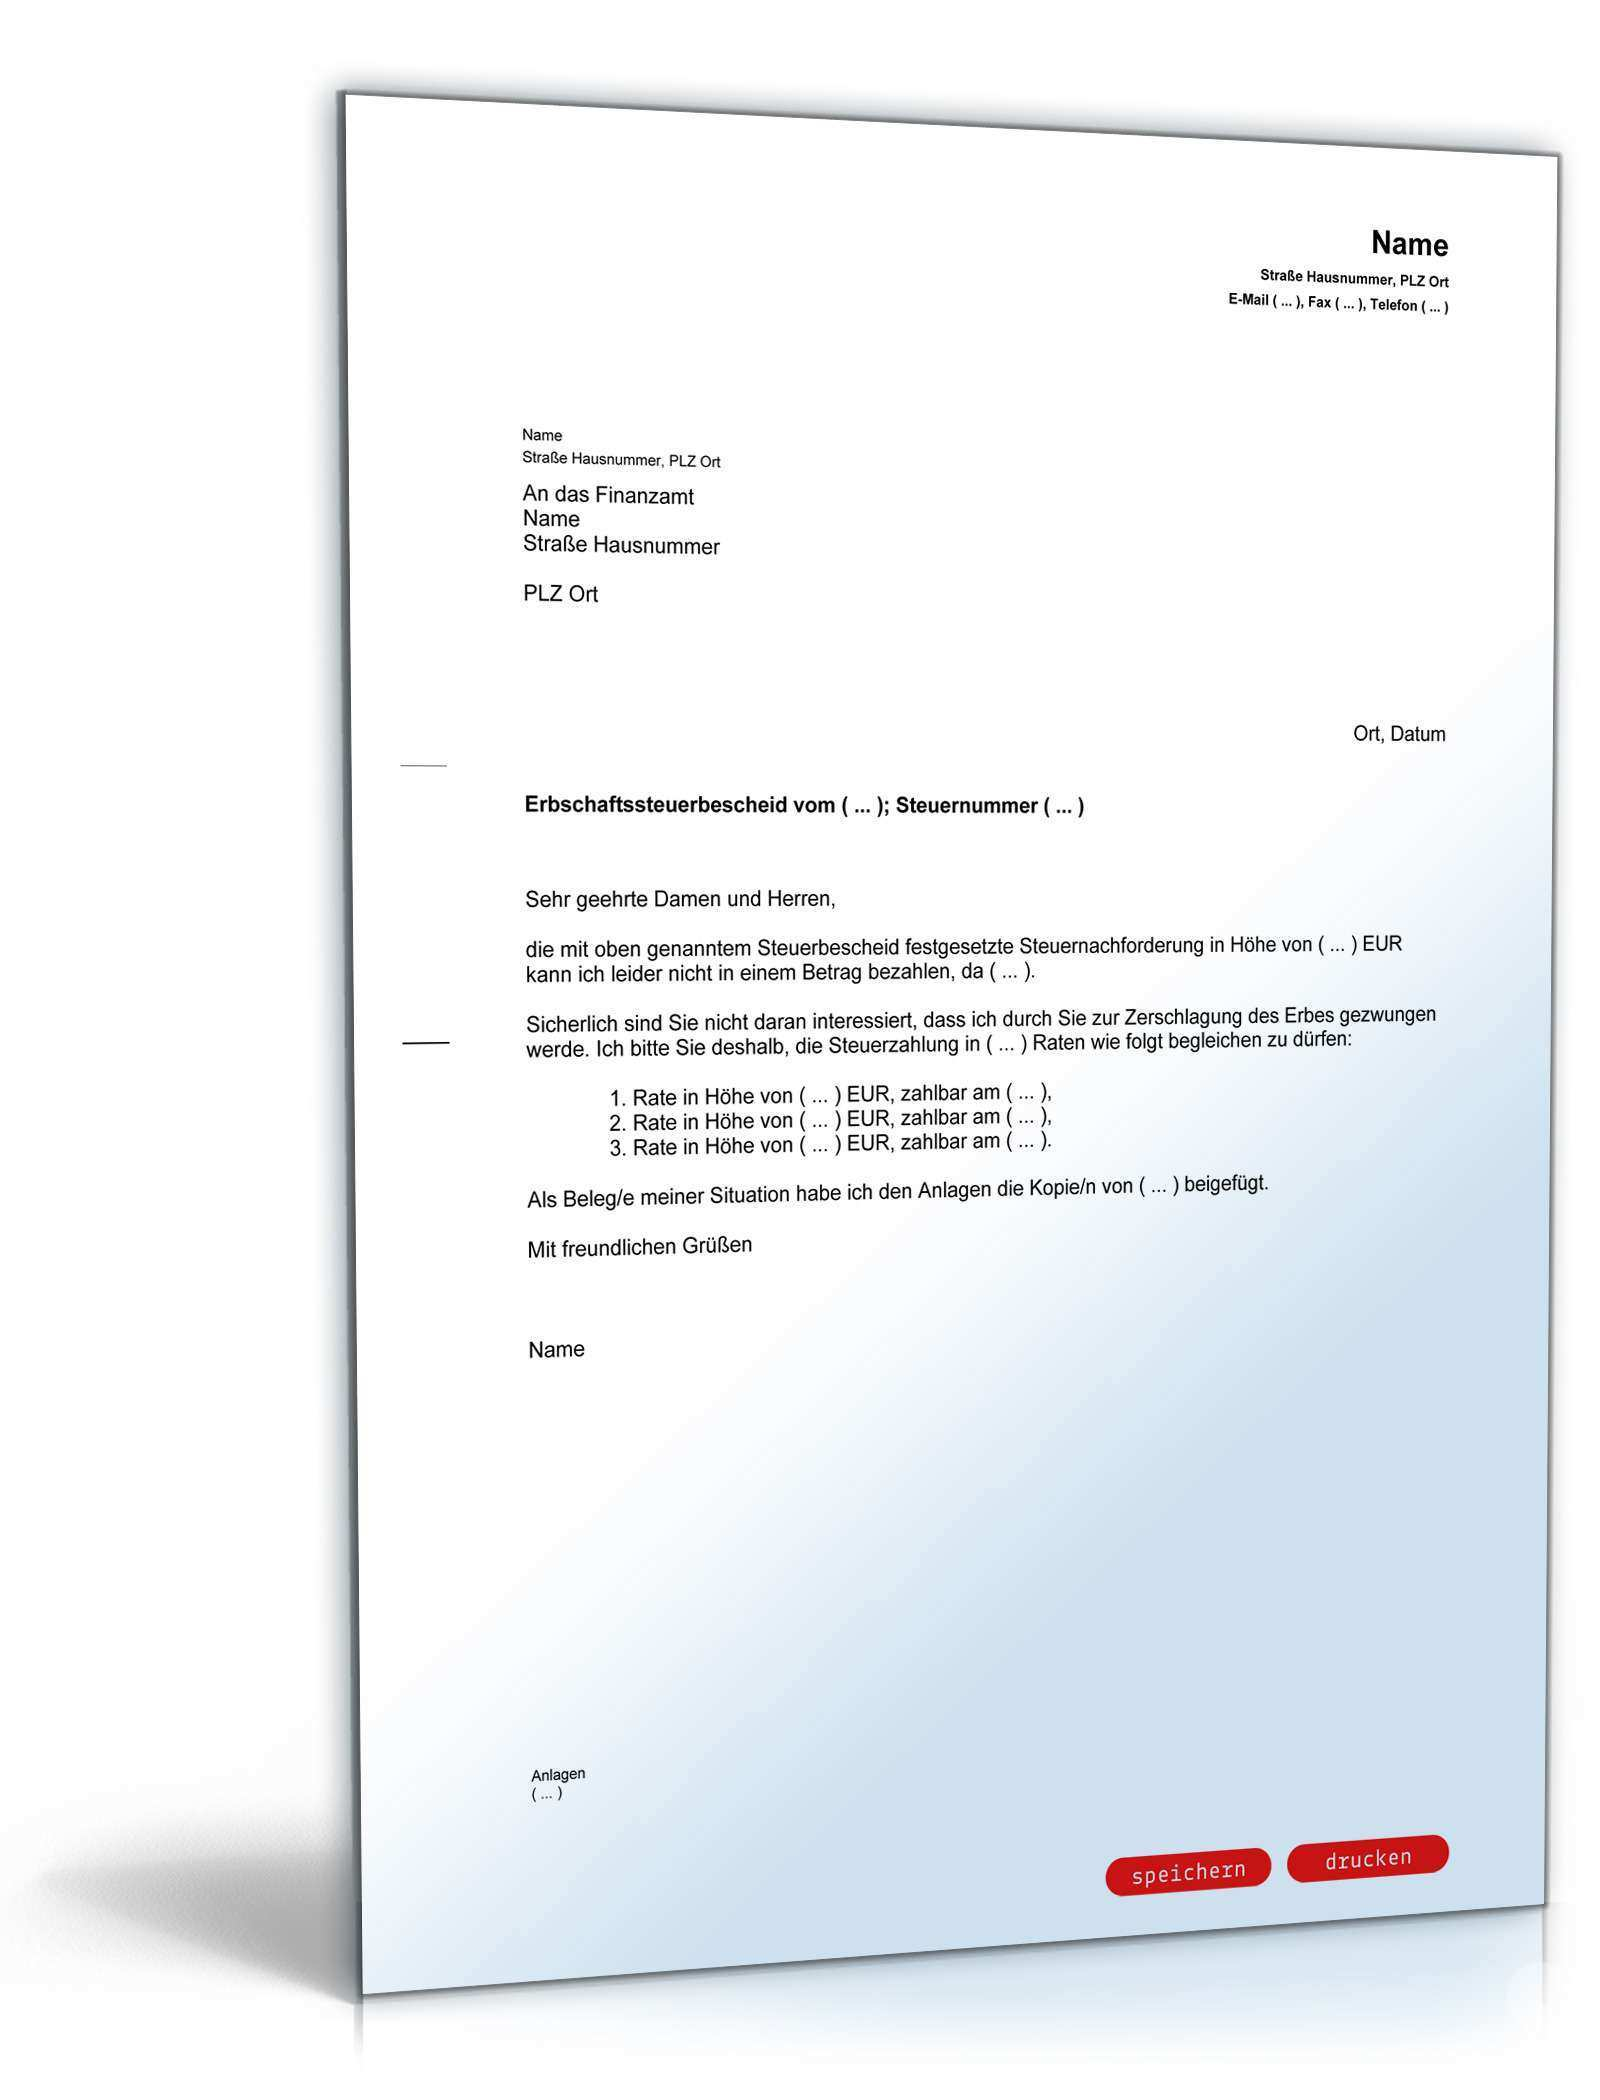 Antrag Ratenzahlung Erbschaftssteuer Muster Zum Download